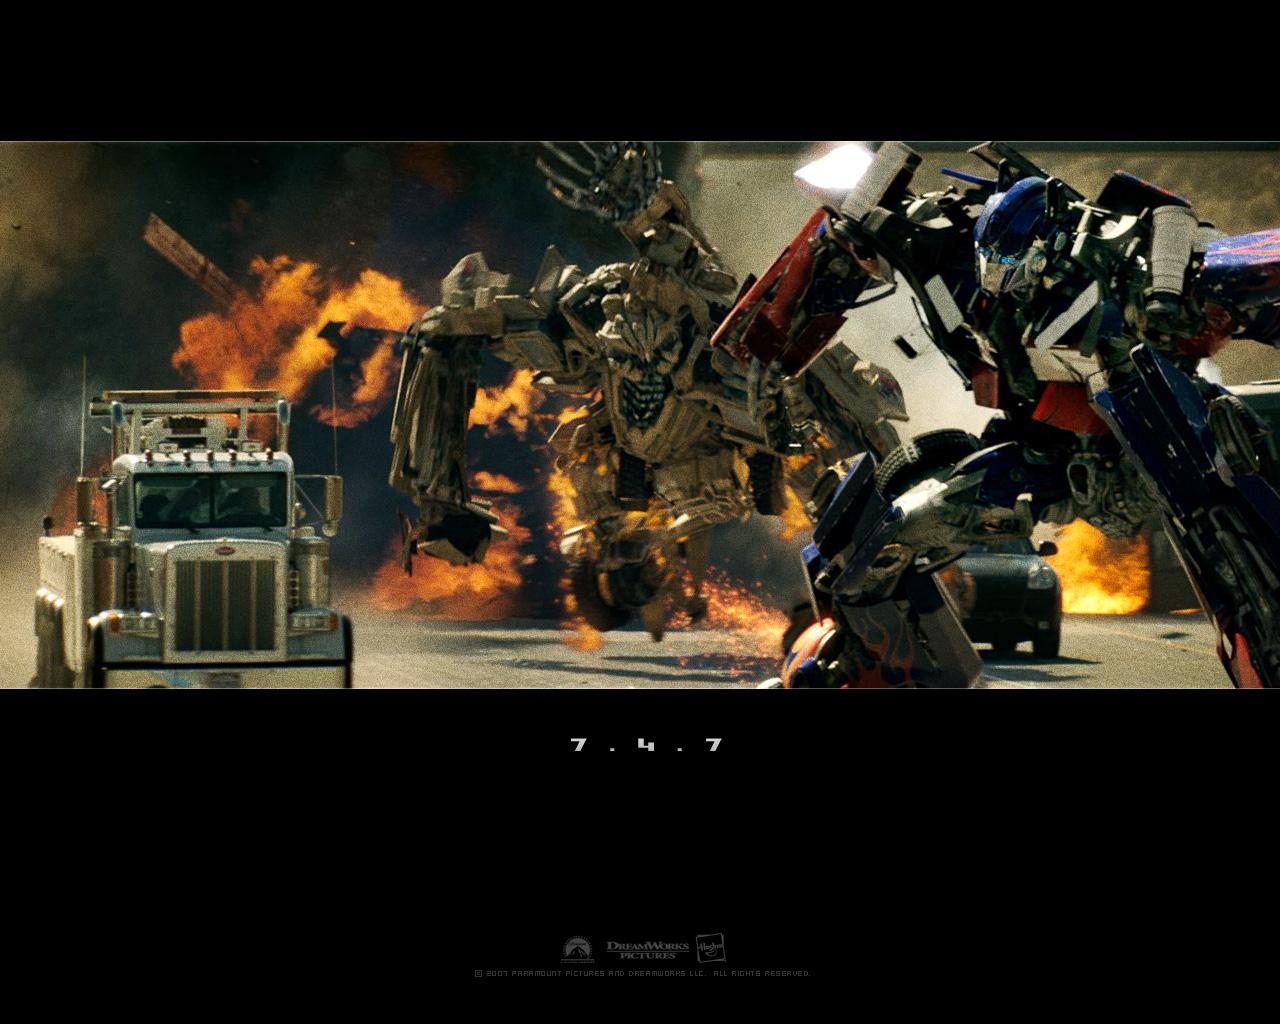 Wallpapers Dekstop 4 U Transformers Wallpaper 1280x1024